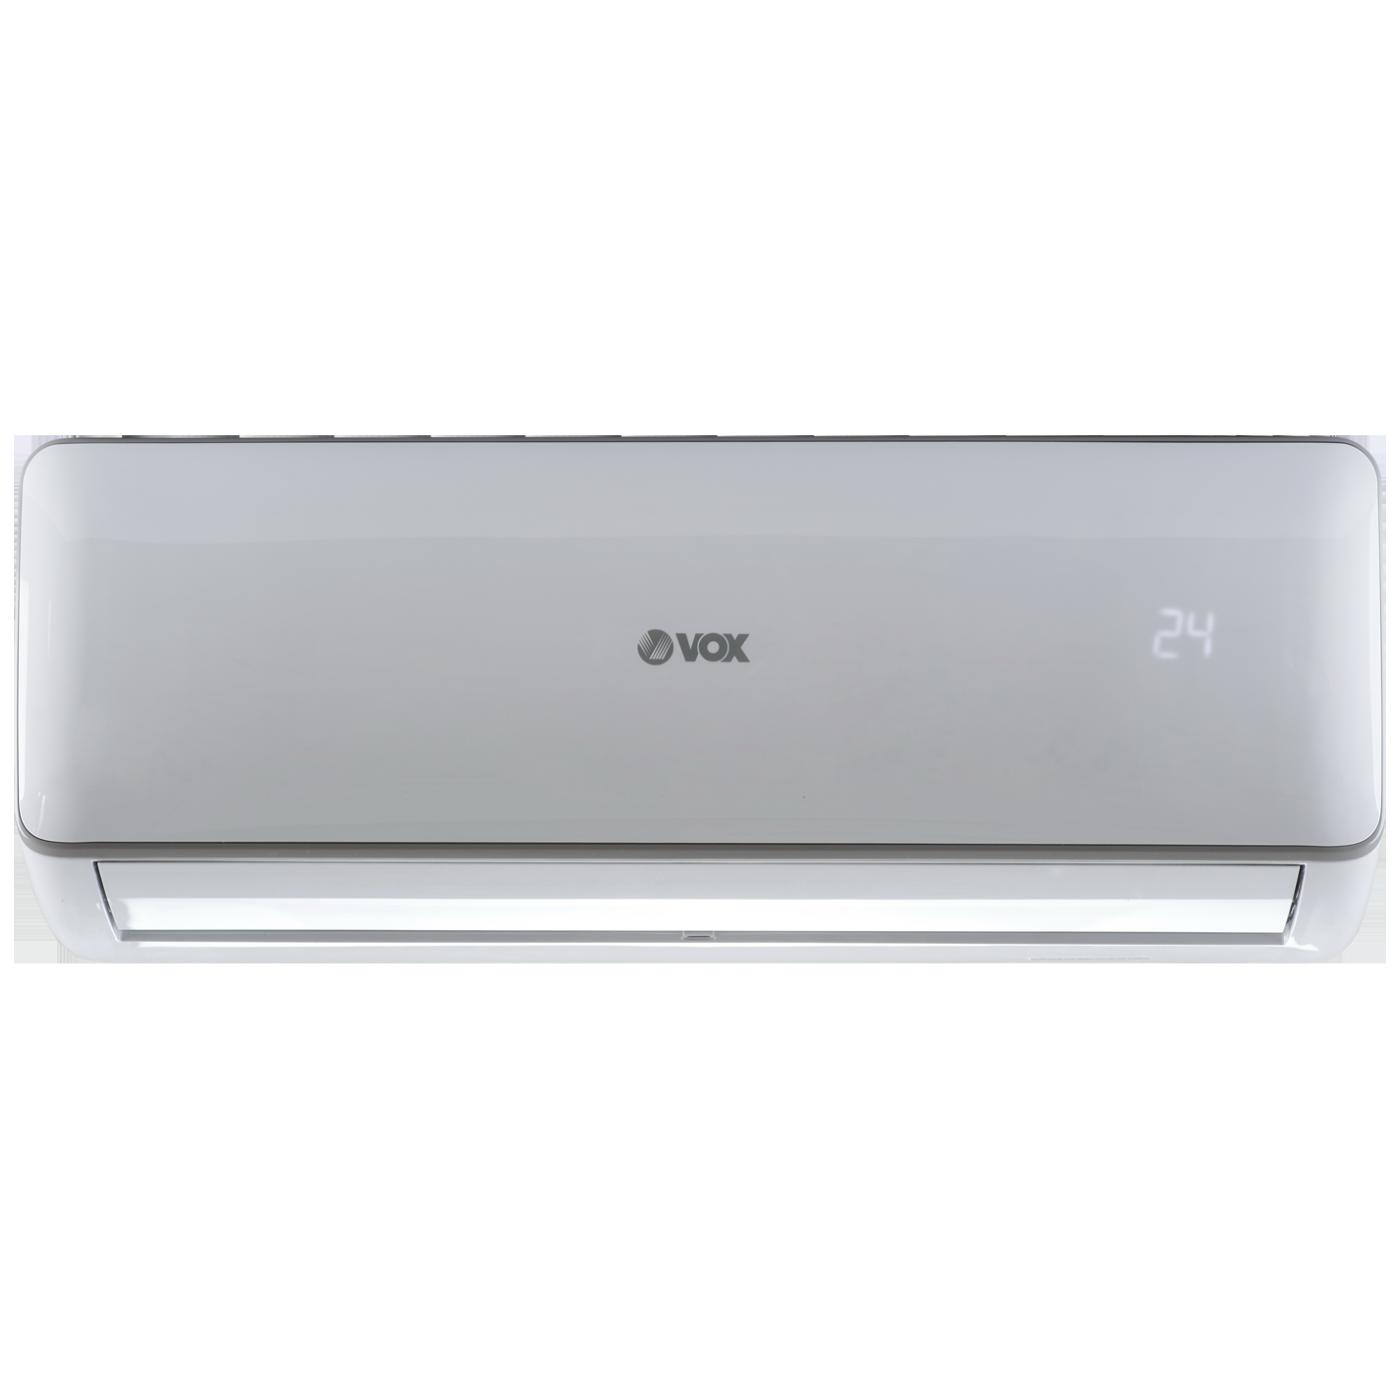 VOX - IVA1 – 12IE